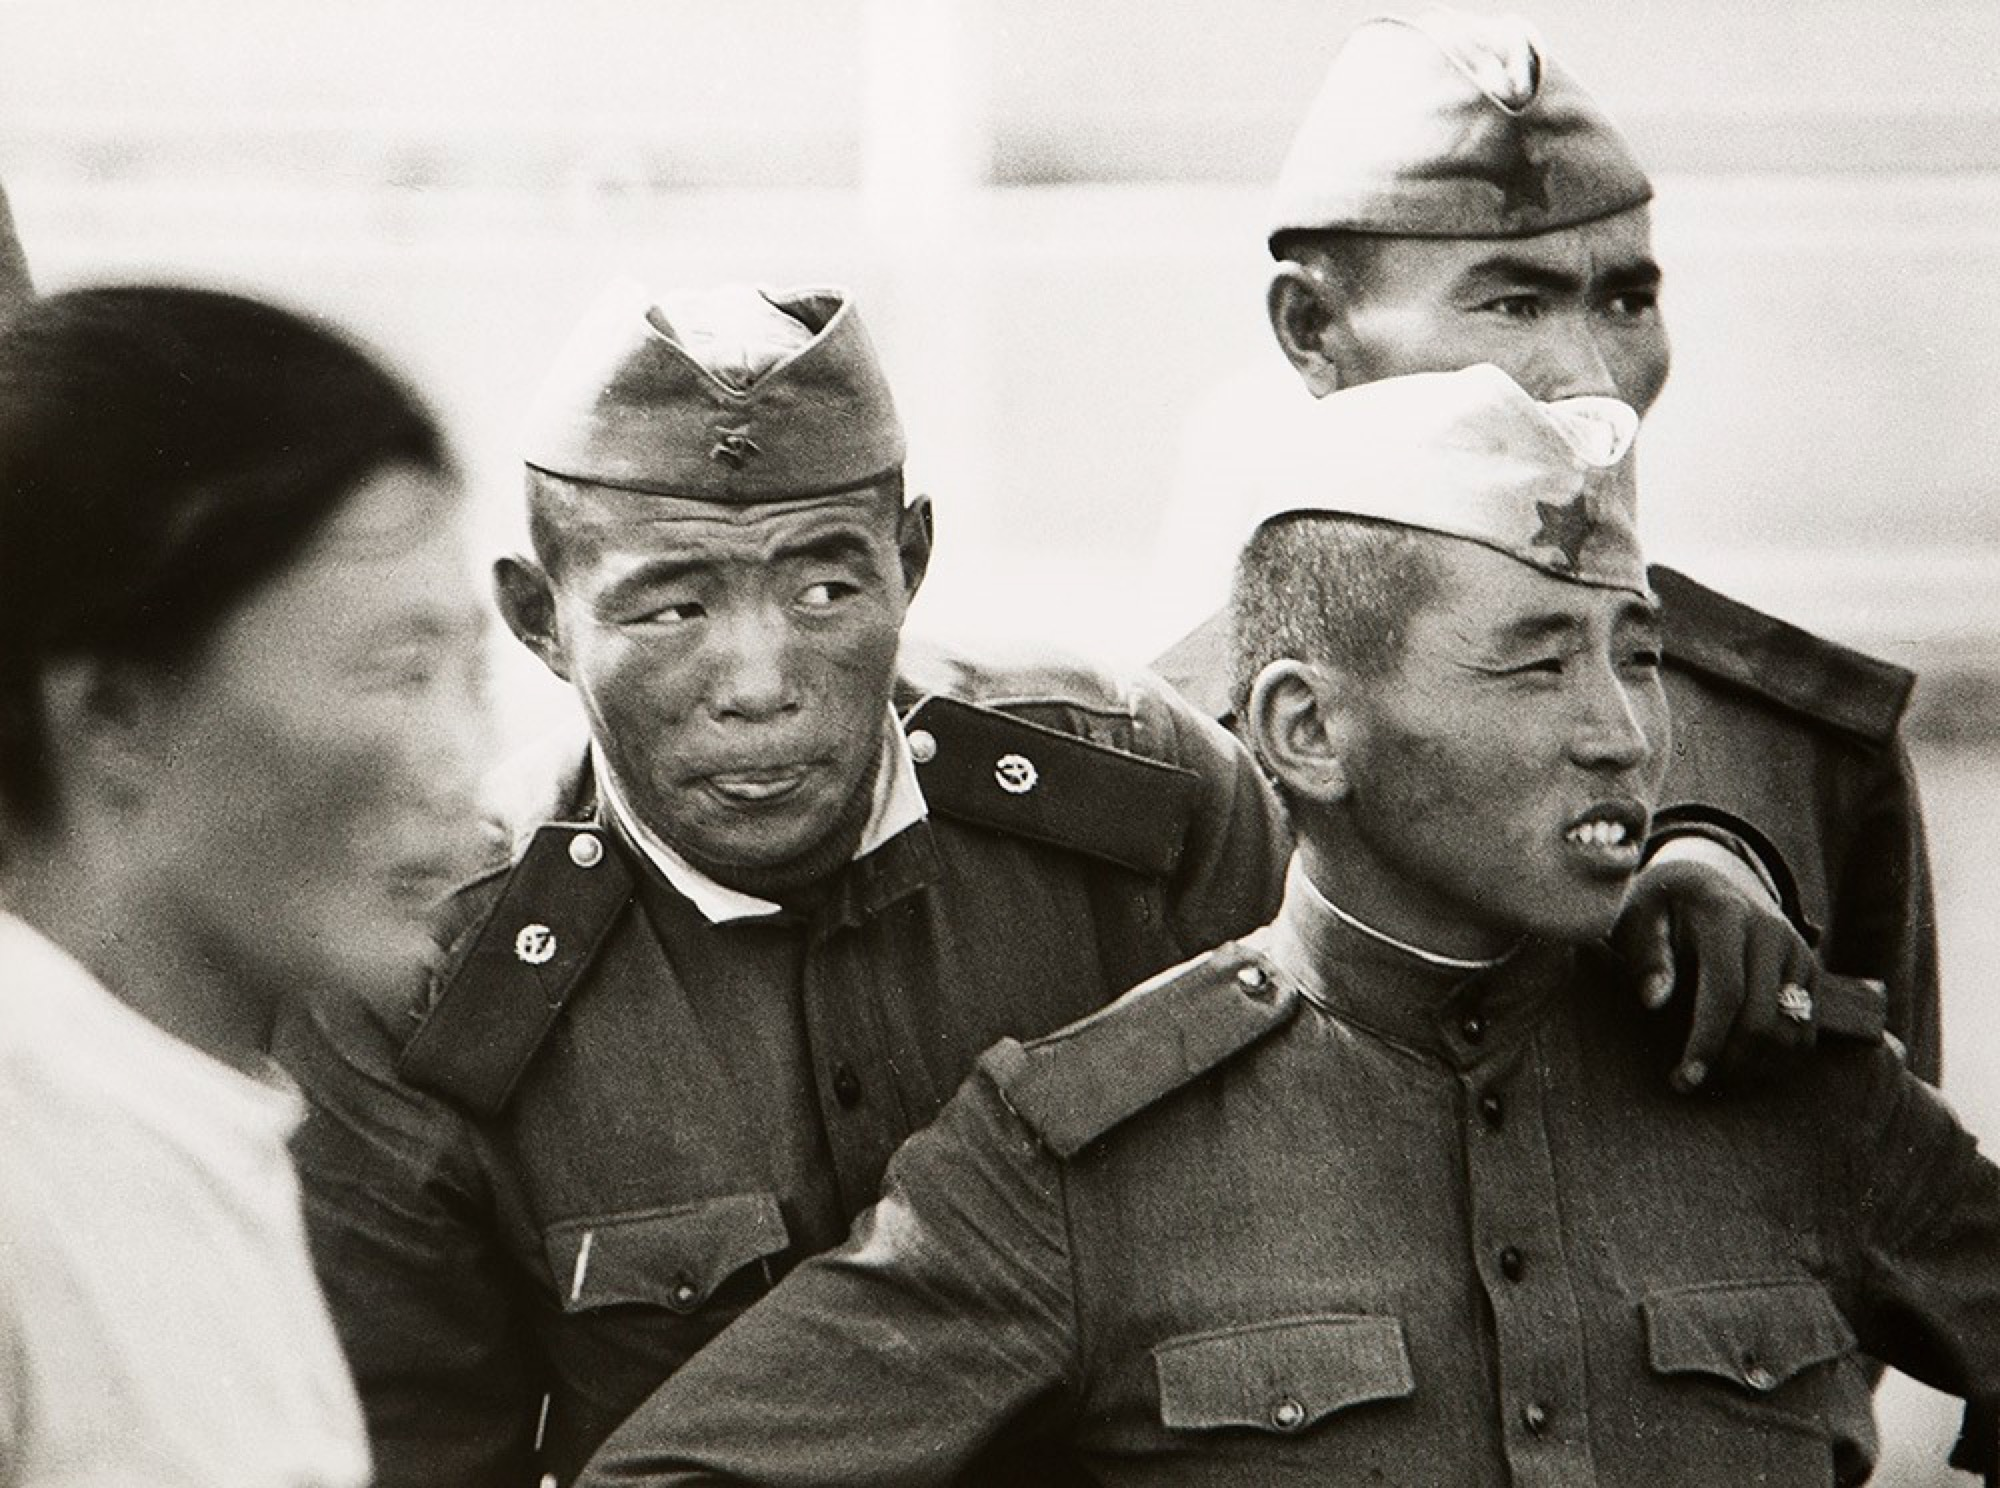 Caio Mario Garrubba (1923-2015) - Forze armate, Mongolia, years 1950-1960 - Vintage [...]